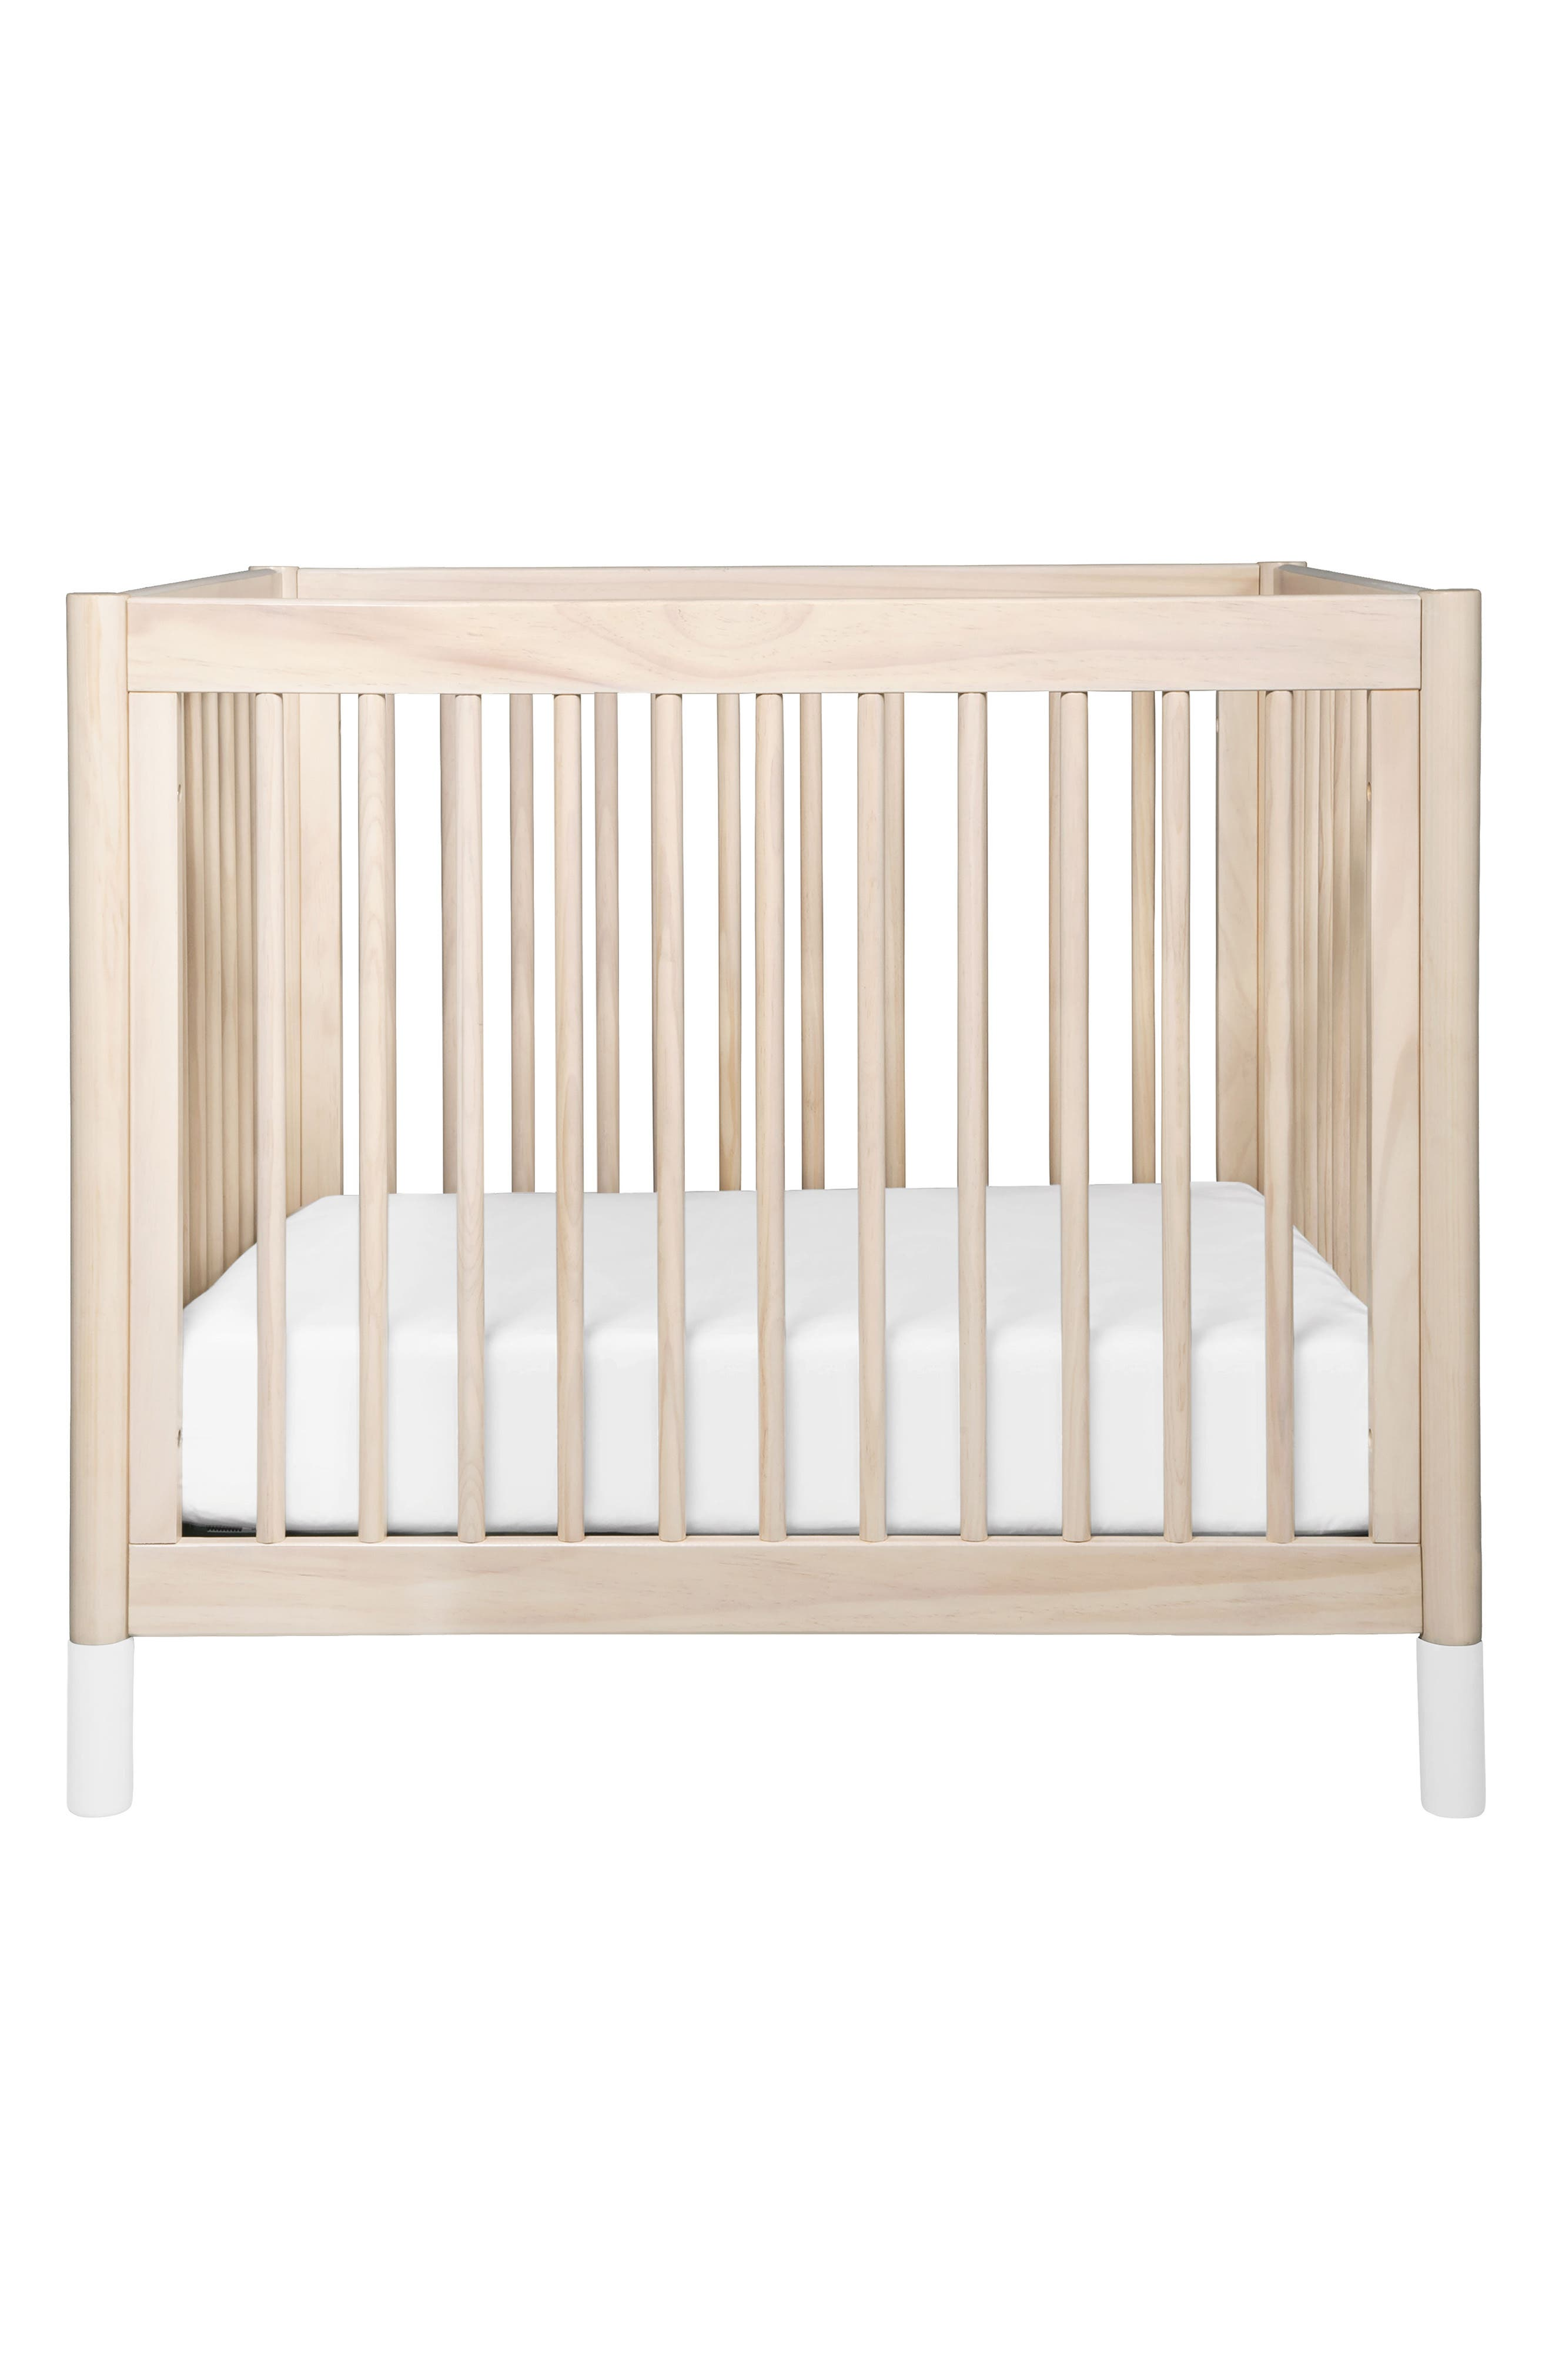 Gelato Mini Crib,                         Main,                         color, Washed Natural And White